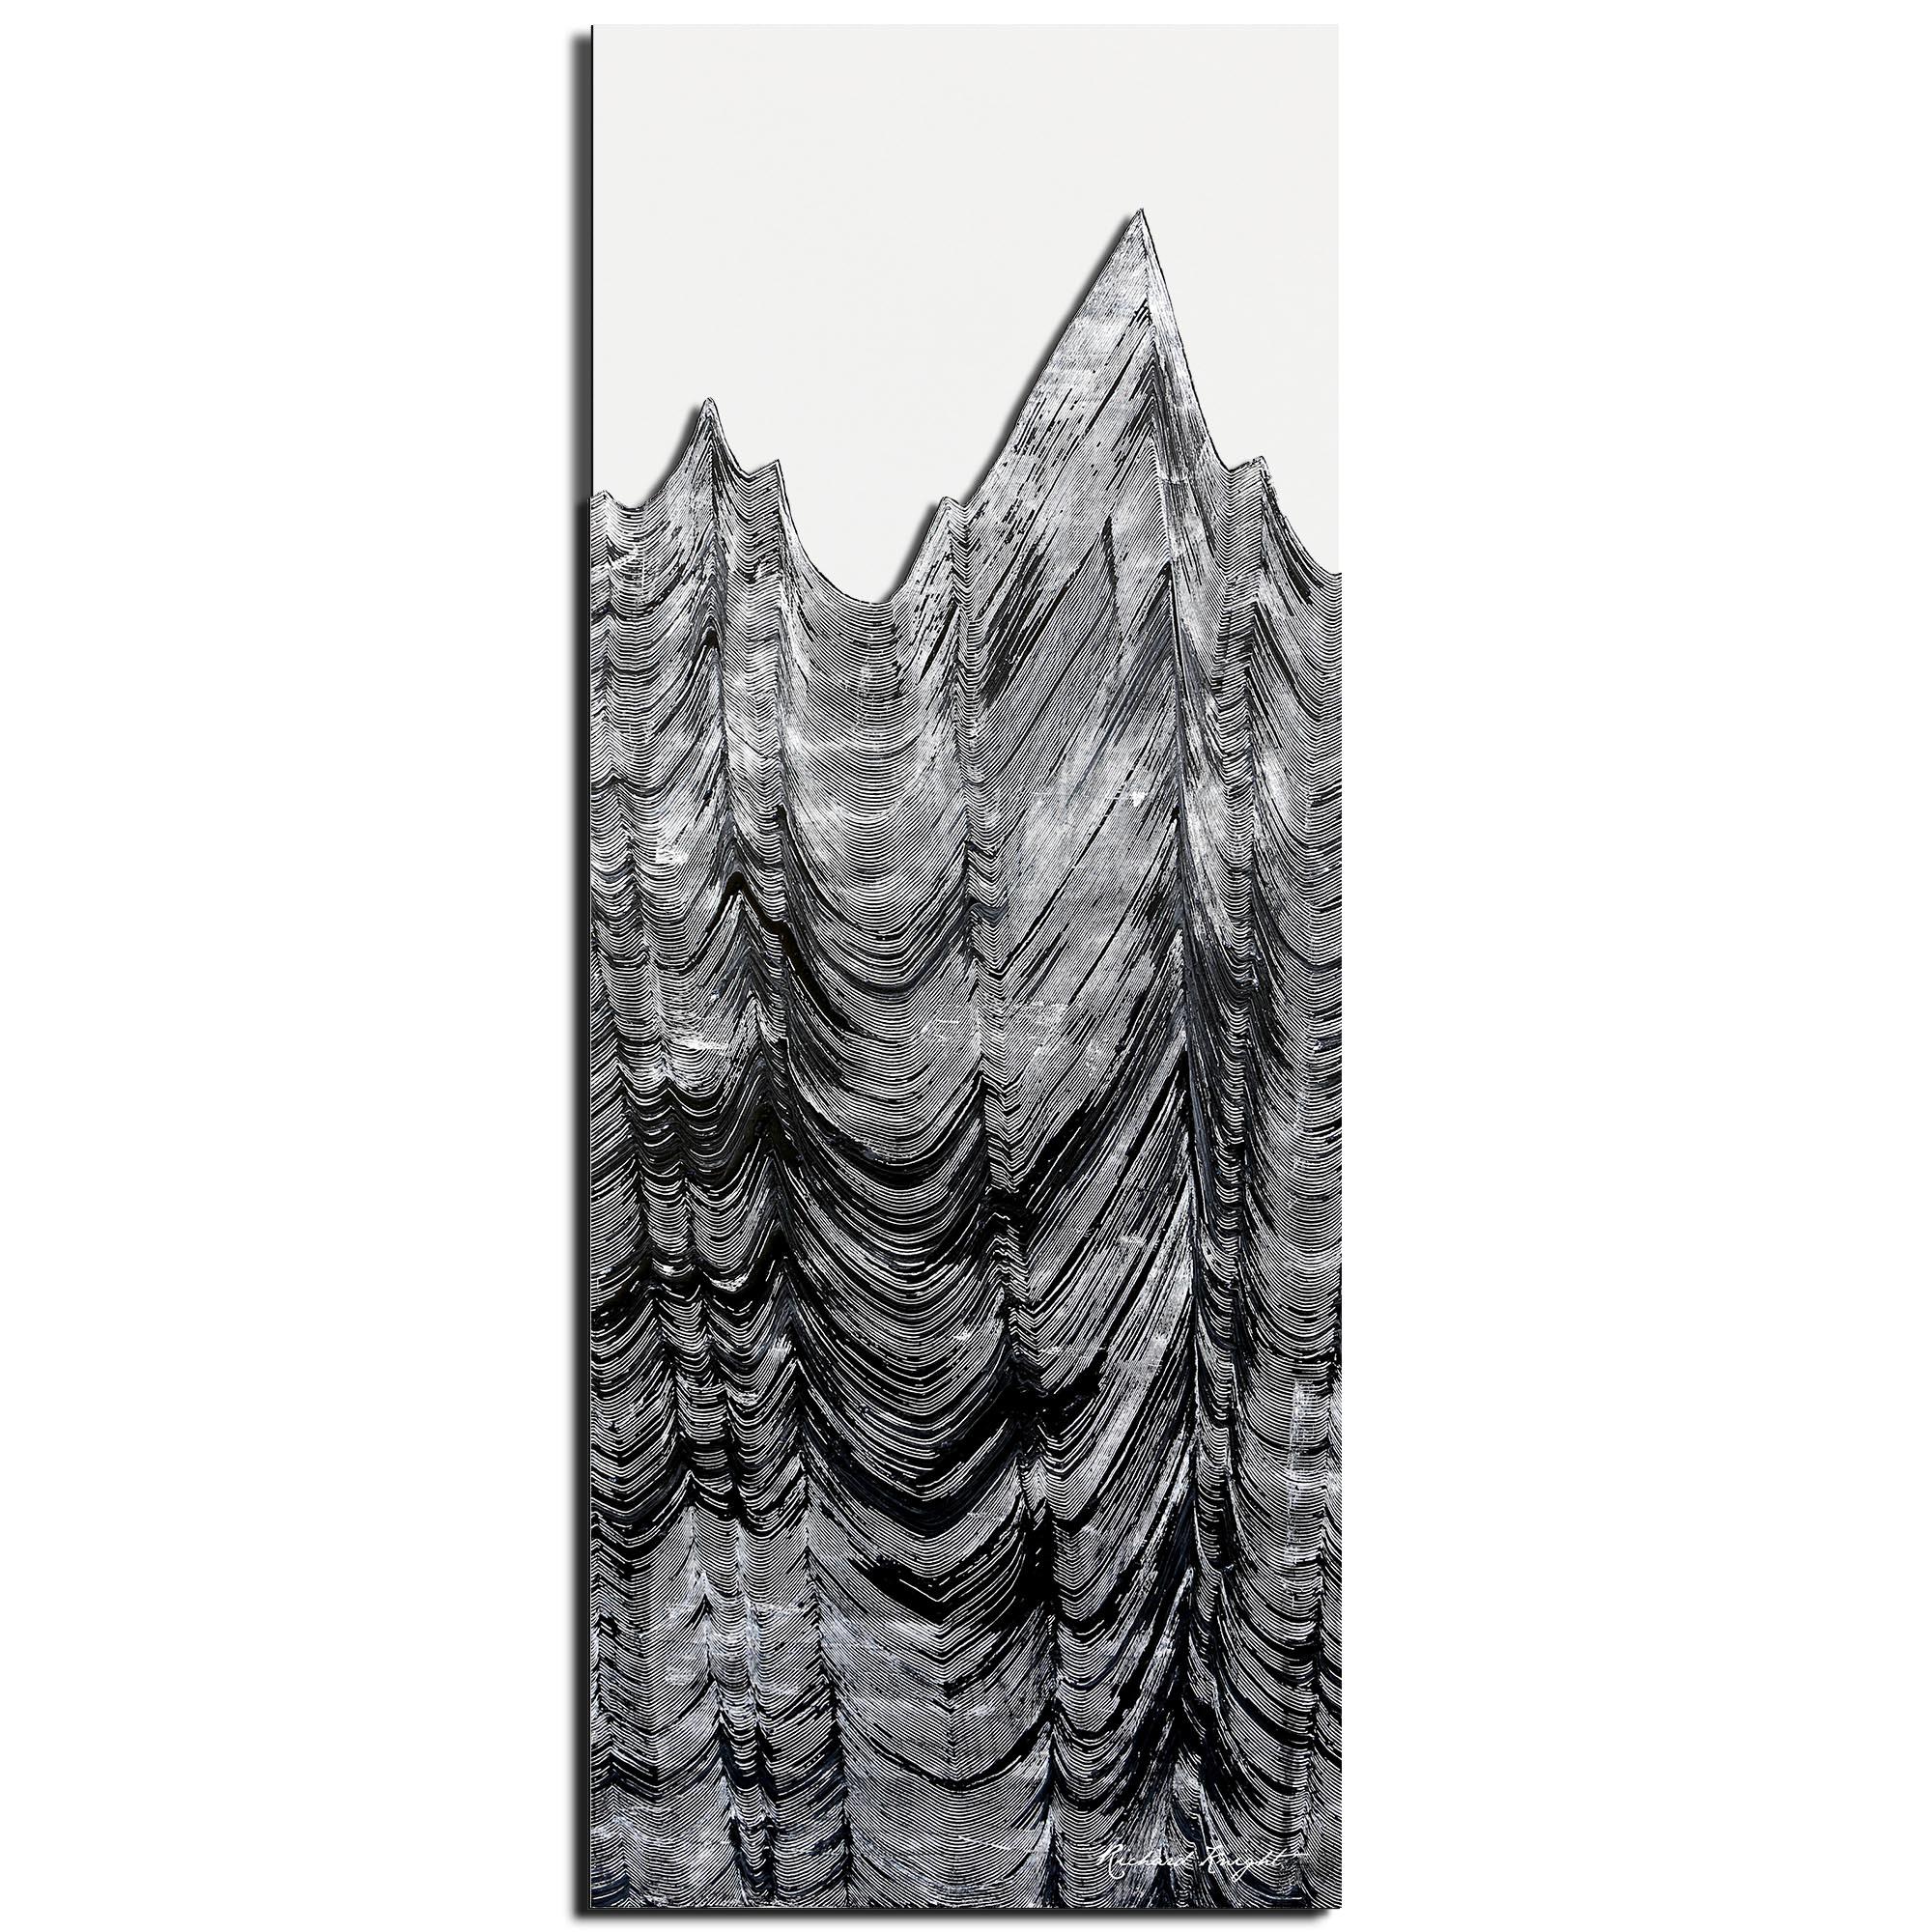 Richard Knight 'Slate Peaks' 19in x 48in Abstract Landscape Art on Polymetal